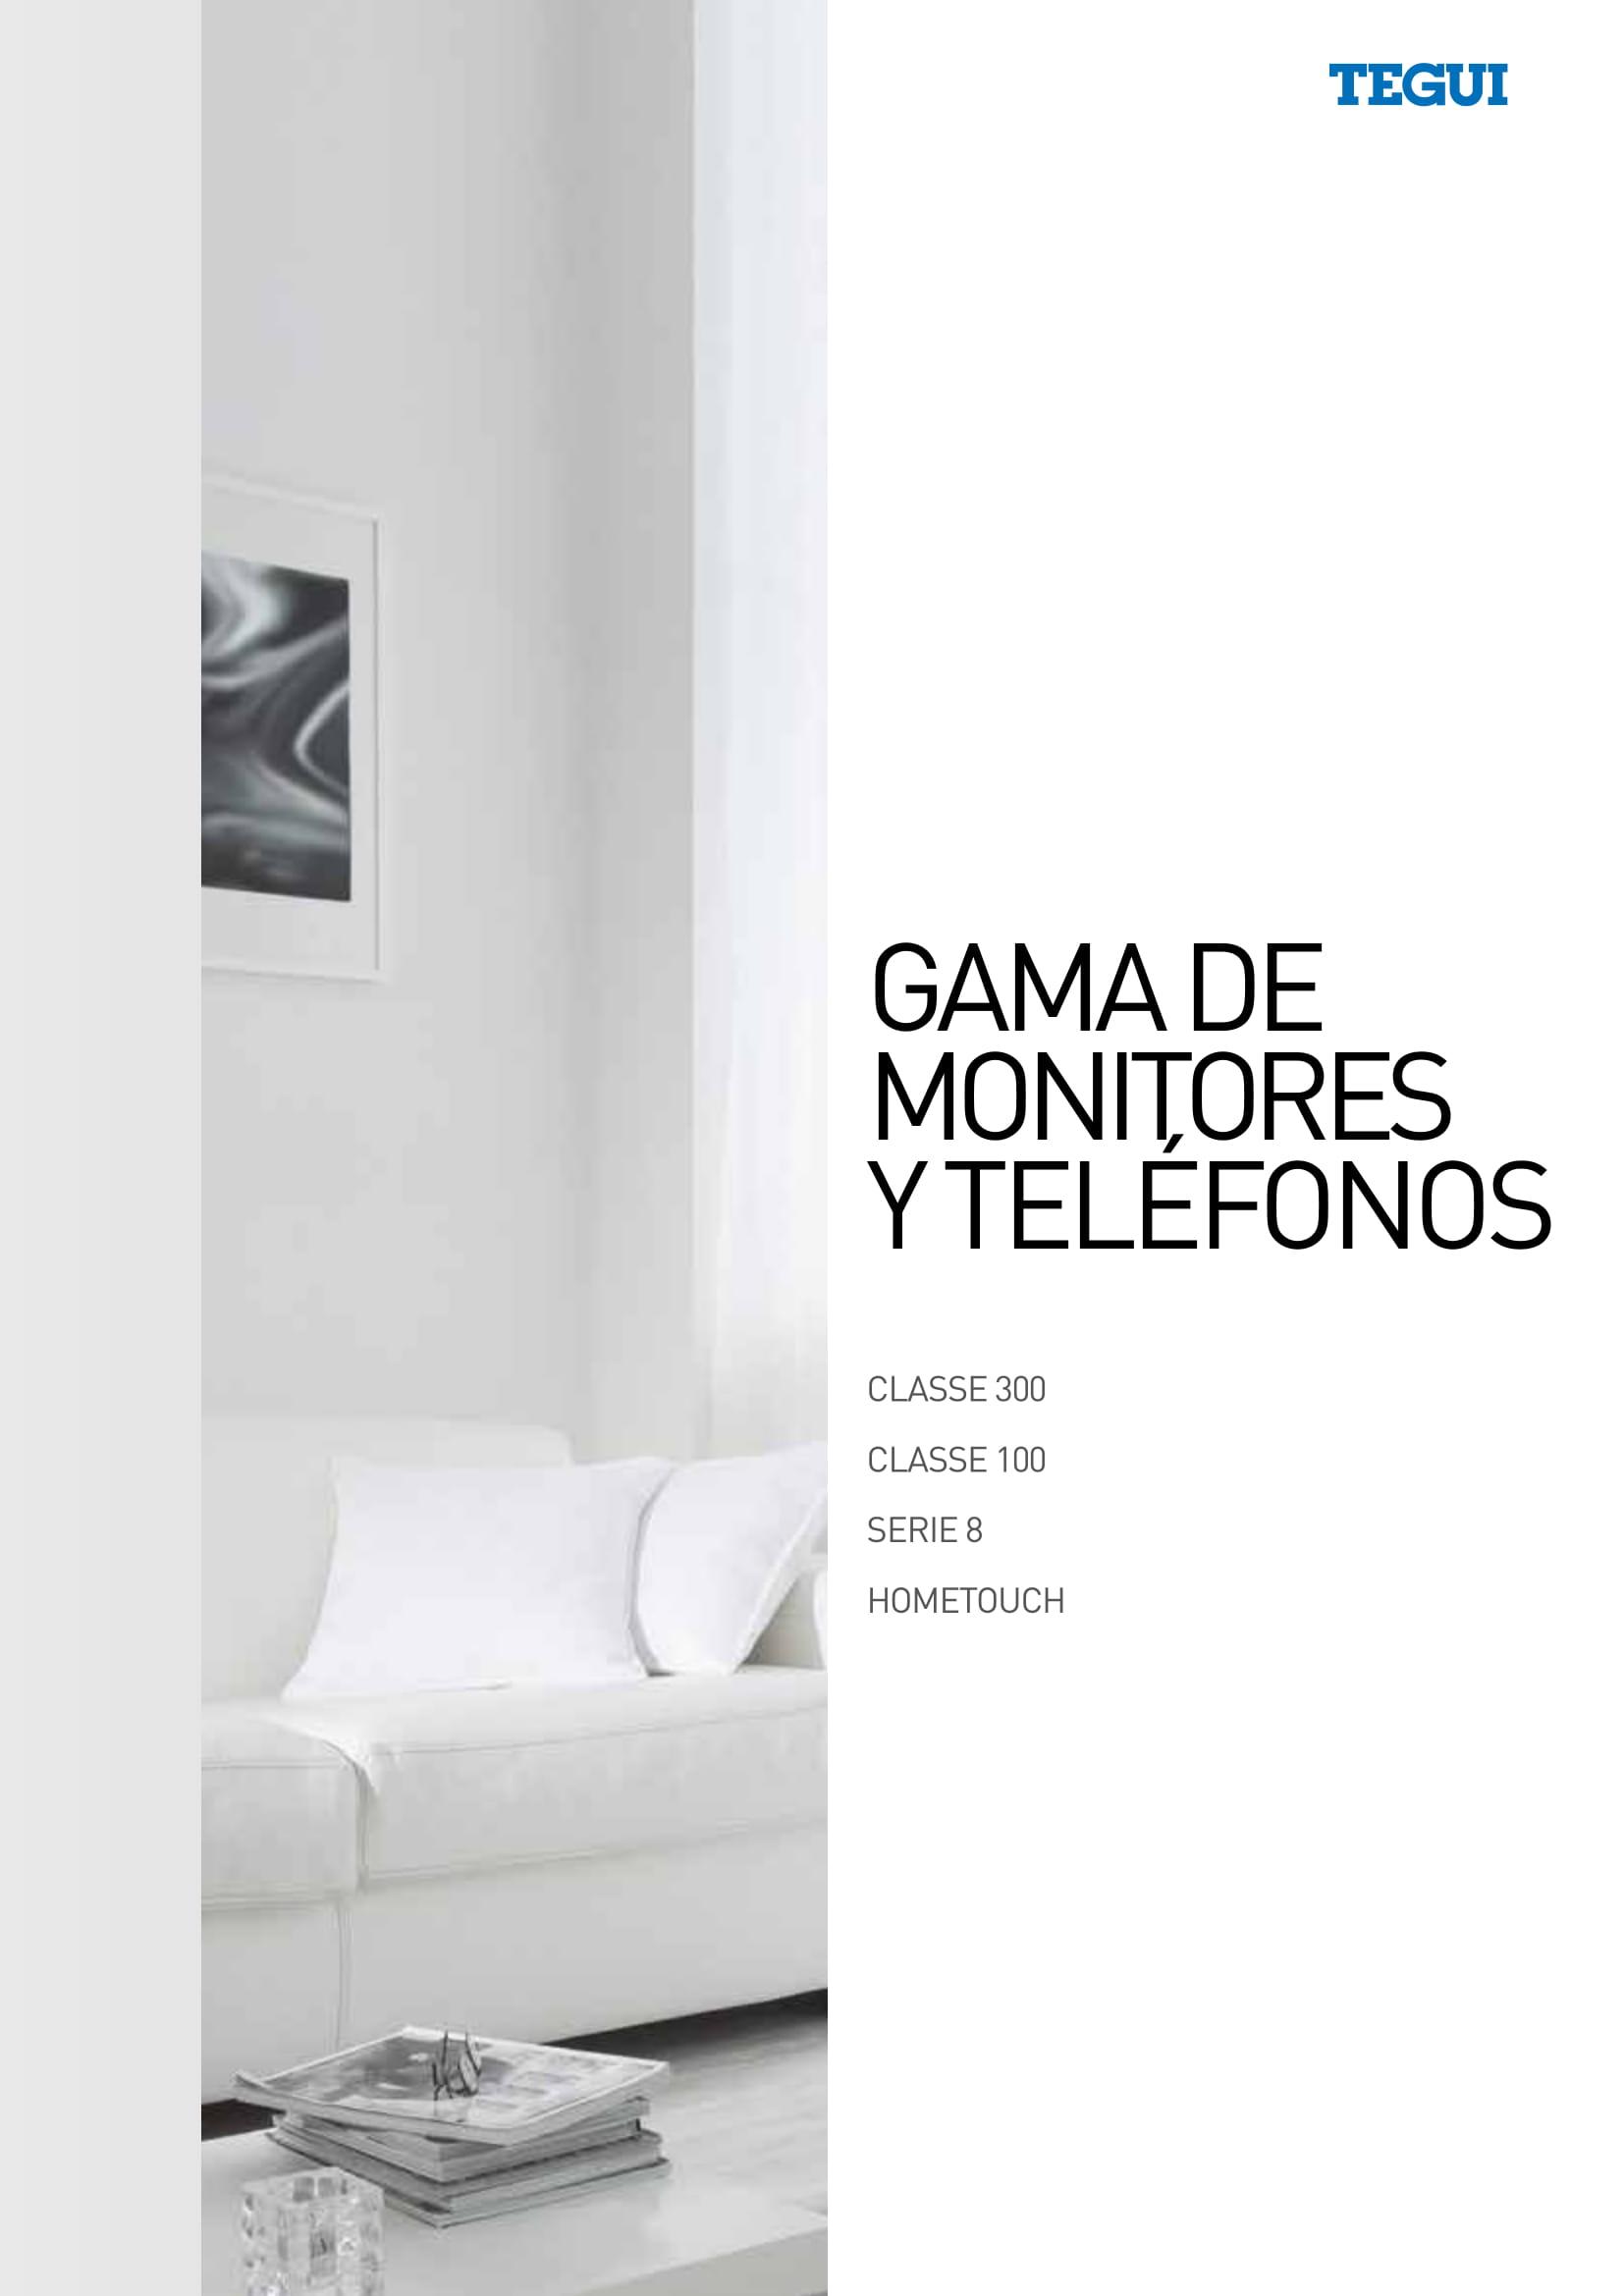 Catalogo-Tarifa-Videoporteros-Porteros-Tegui-033